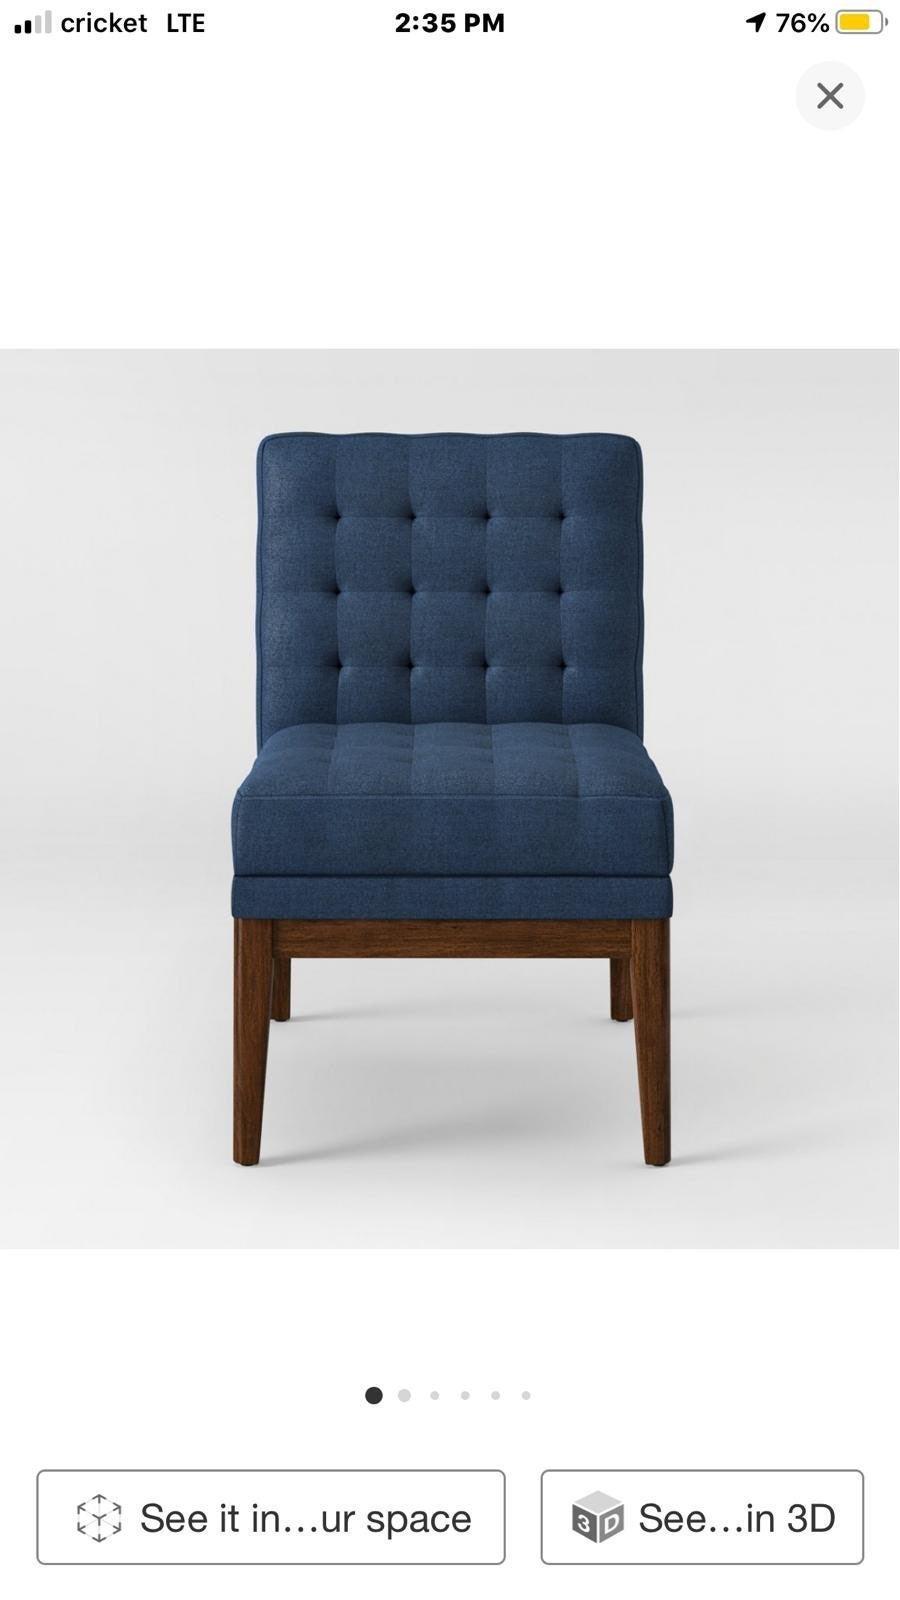 Newark Tufted Slipper Chair with Wood Ba